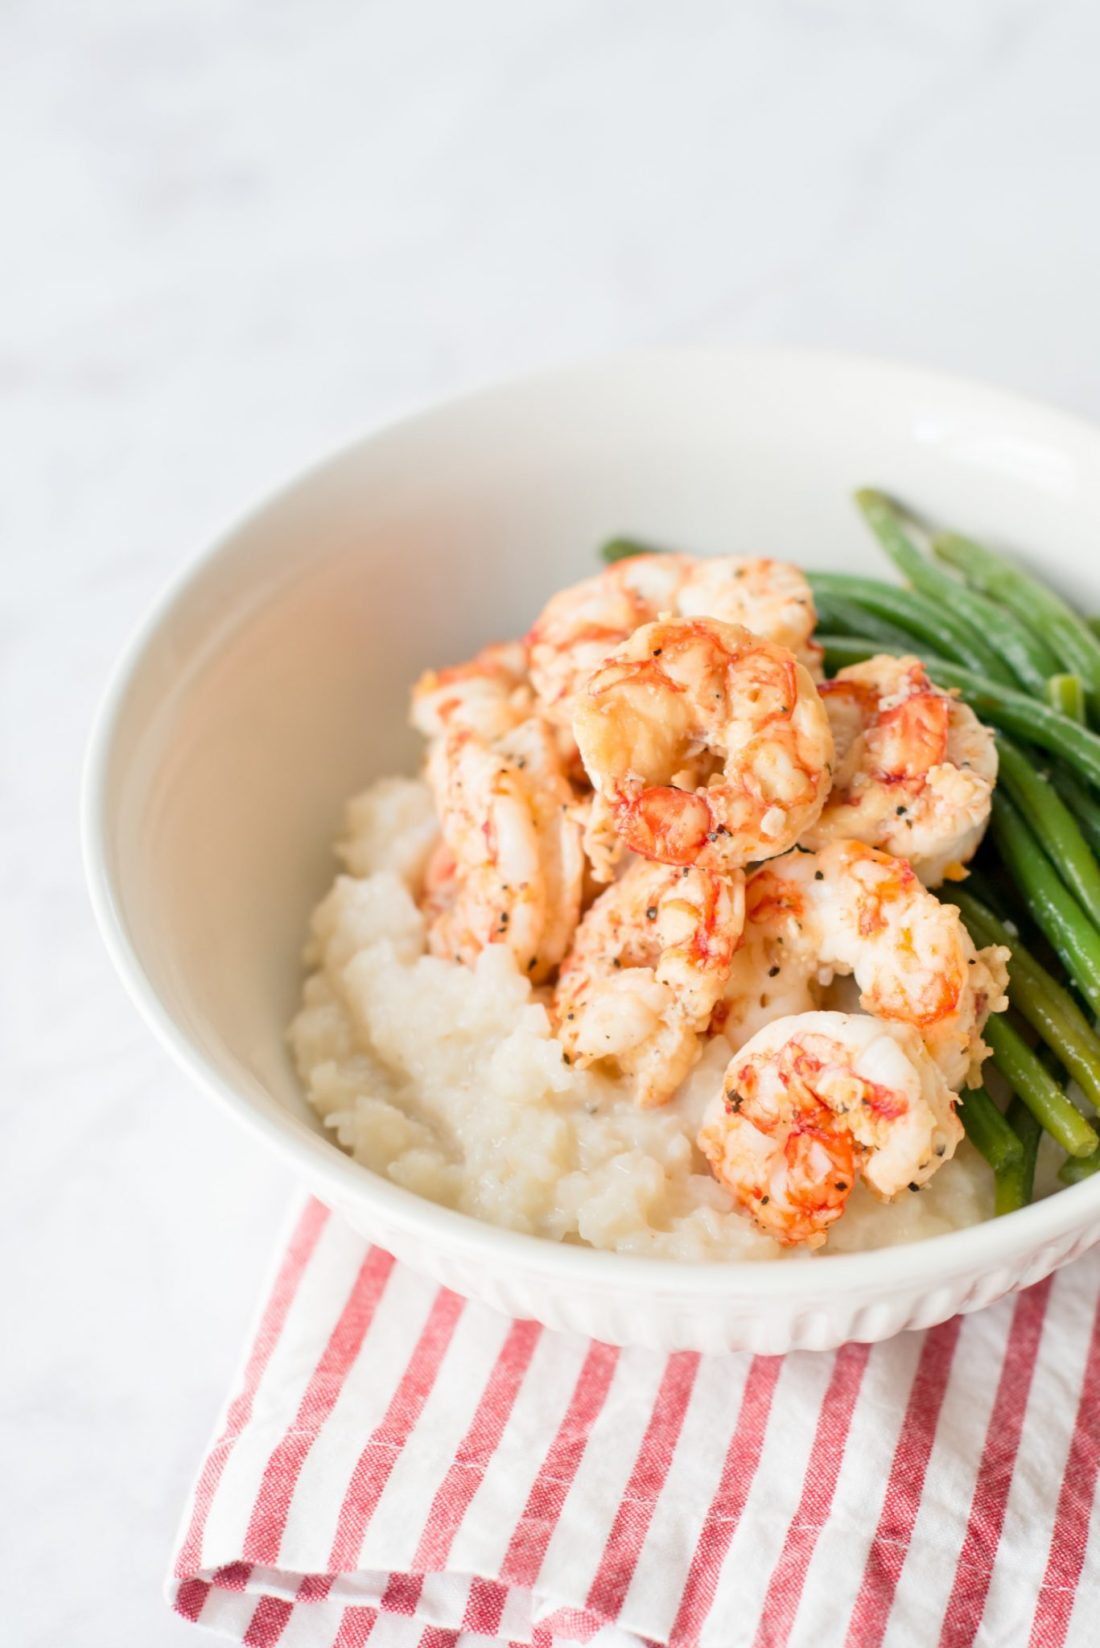 Healthy, Low Carb Shrimp & Grits